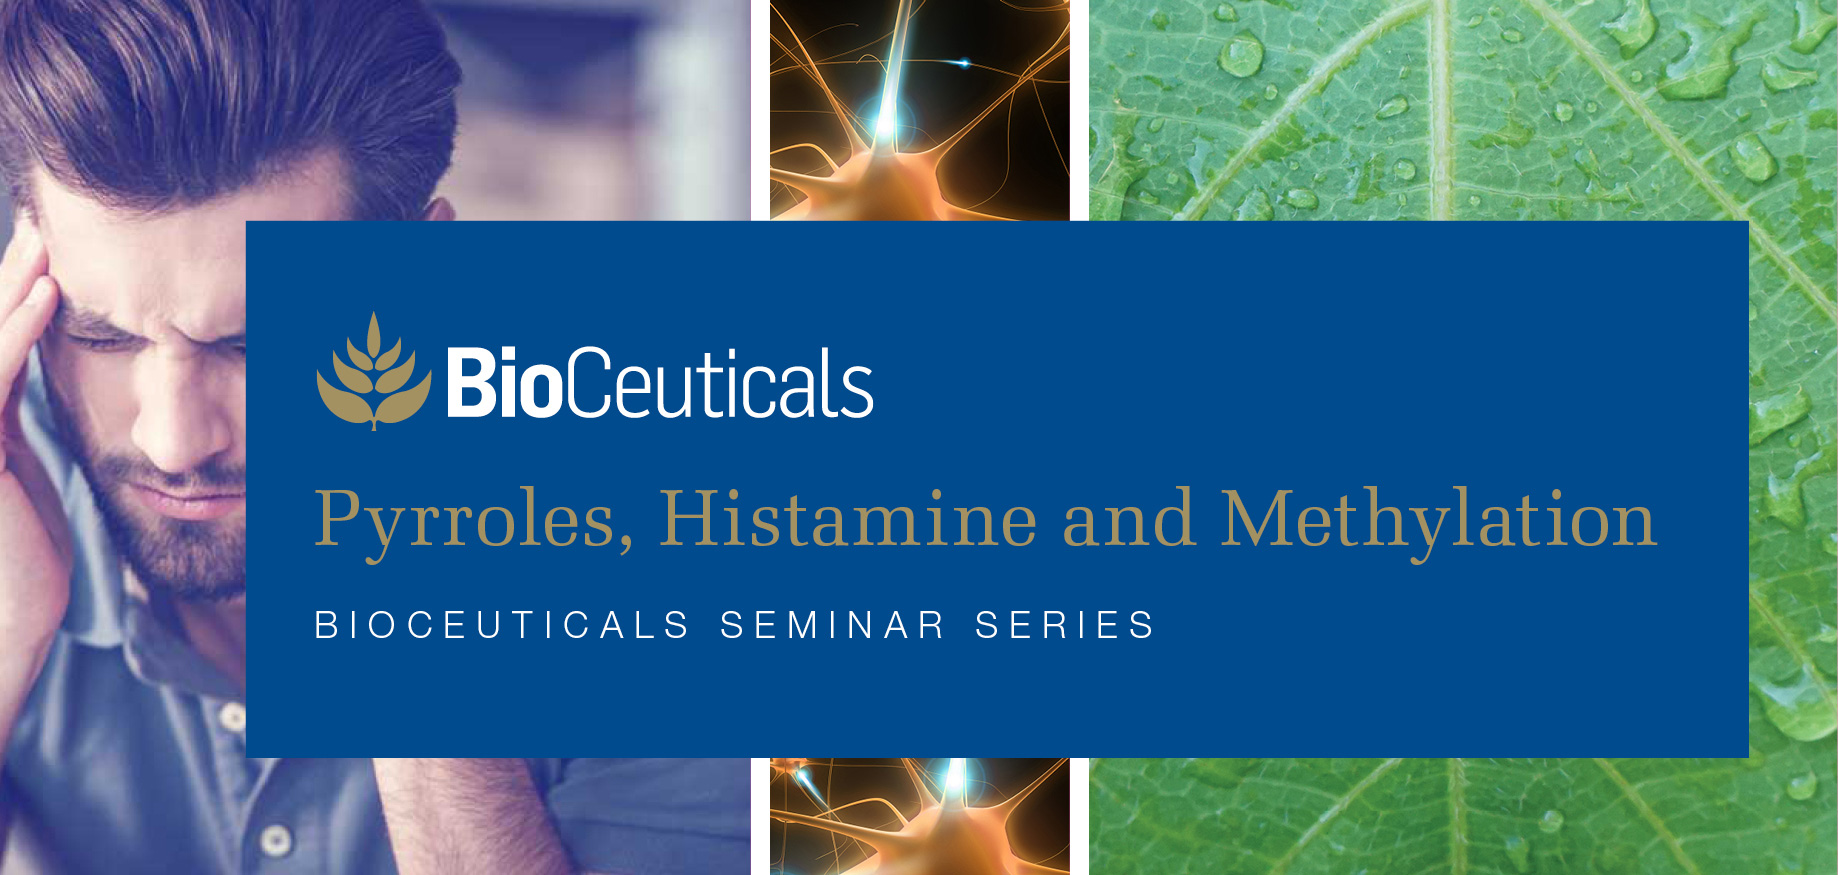 Pyrroles, Histamine and Methylation - Sydney